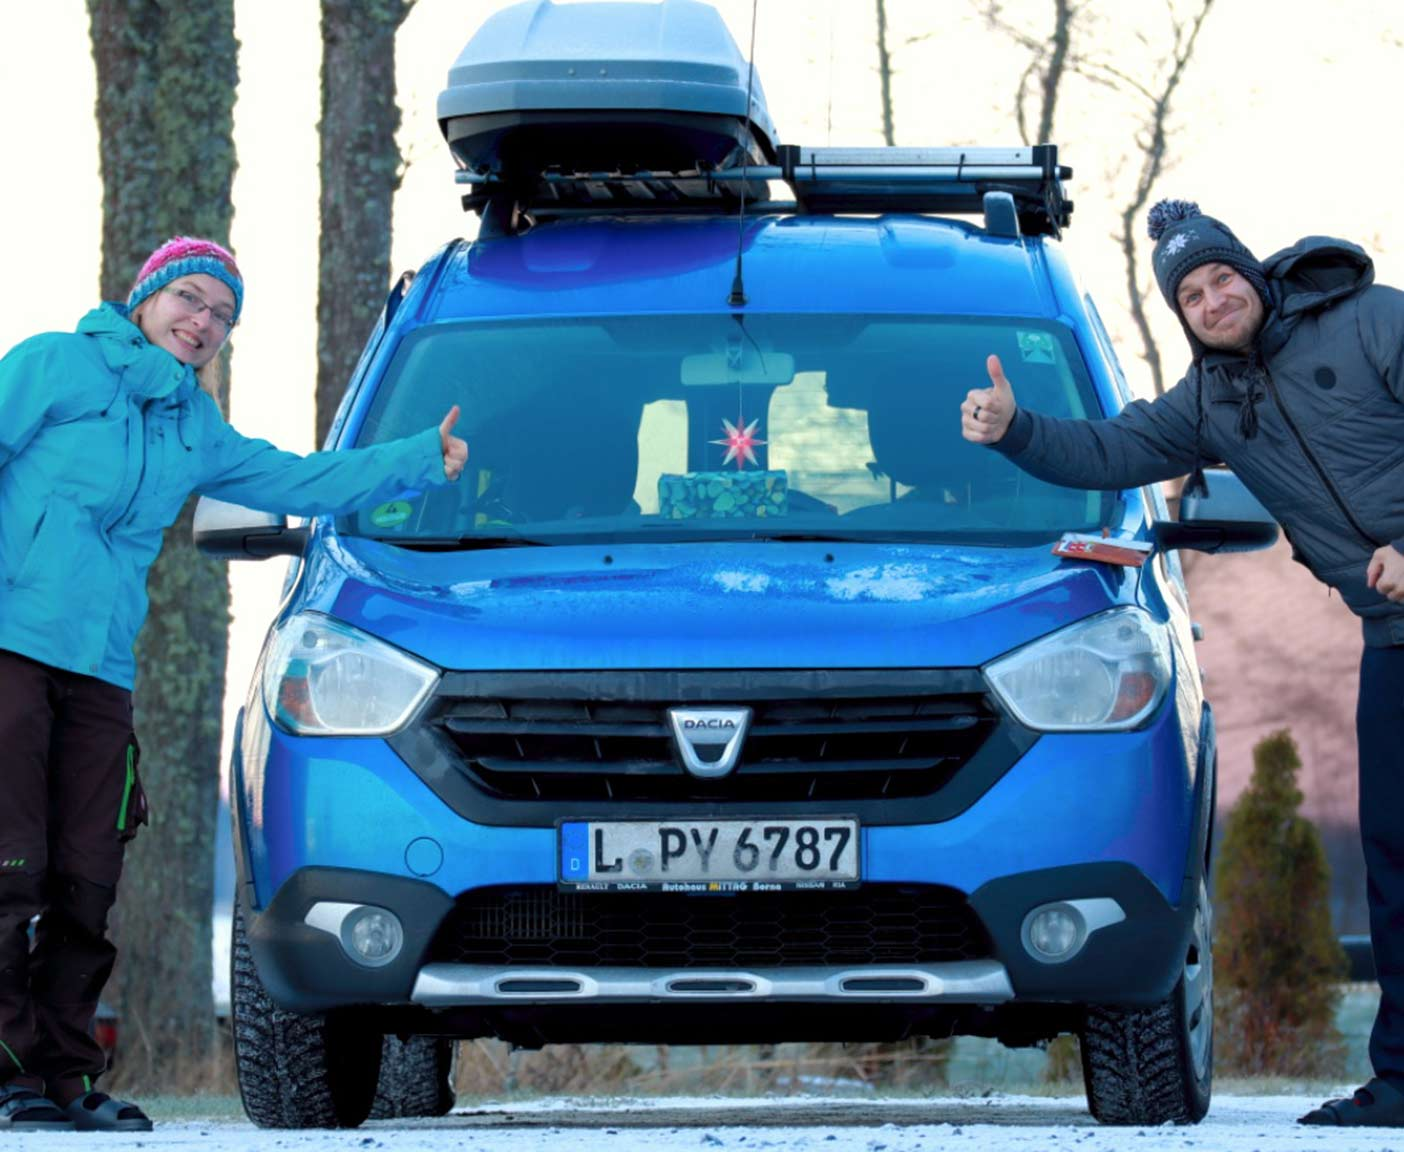 Dacia-stepway-preis-mikrocamper-automatik-kombi-logan-celebration-camper